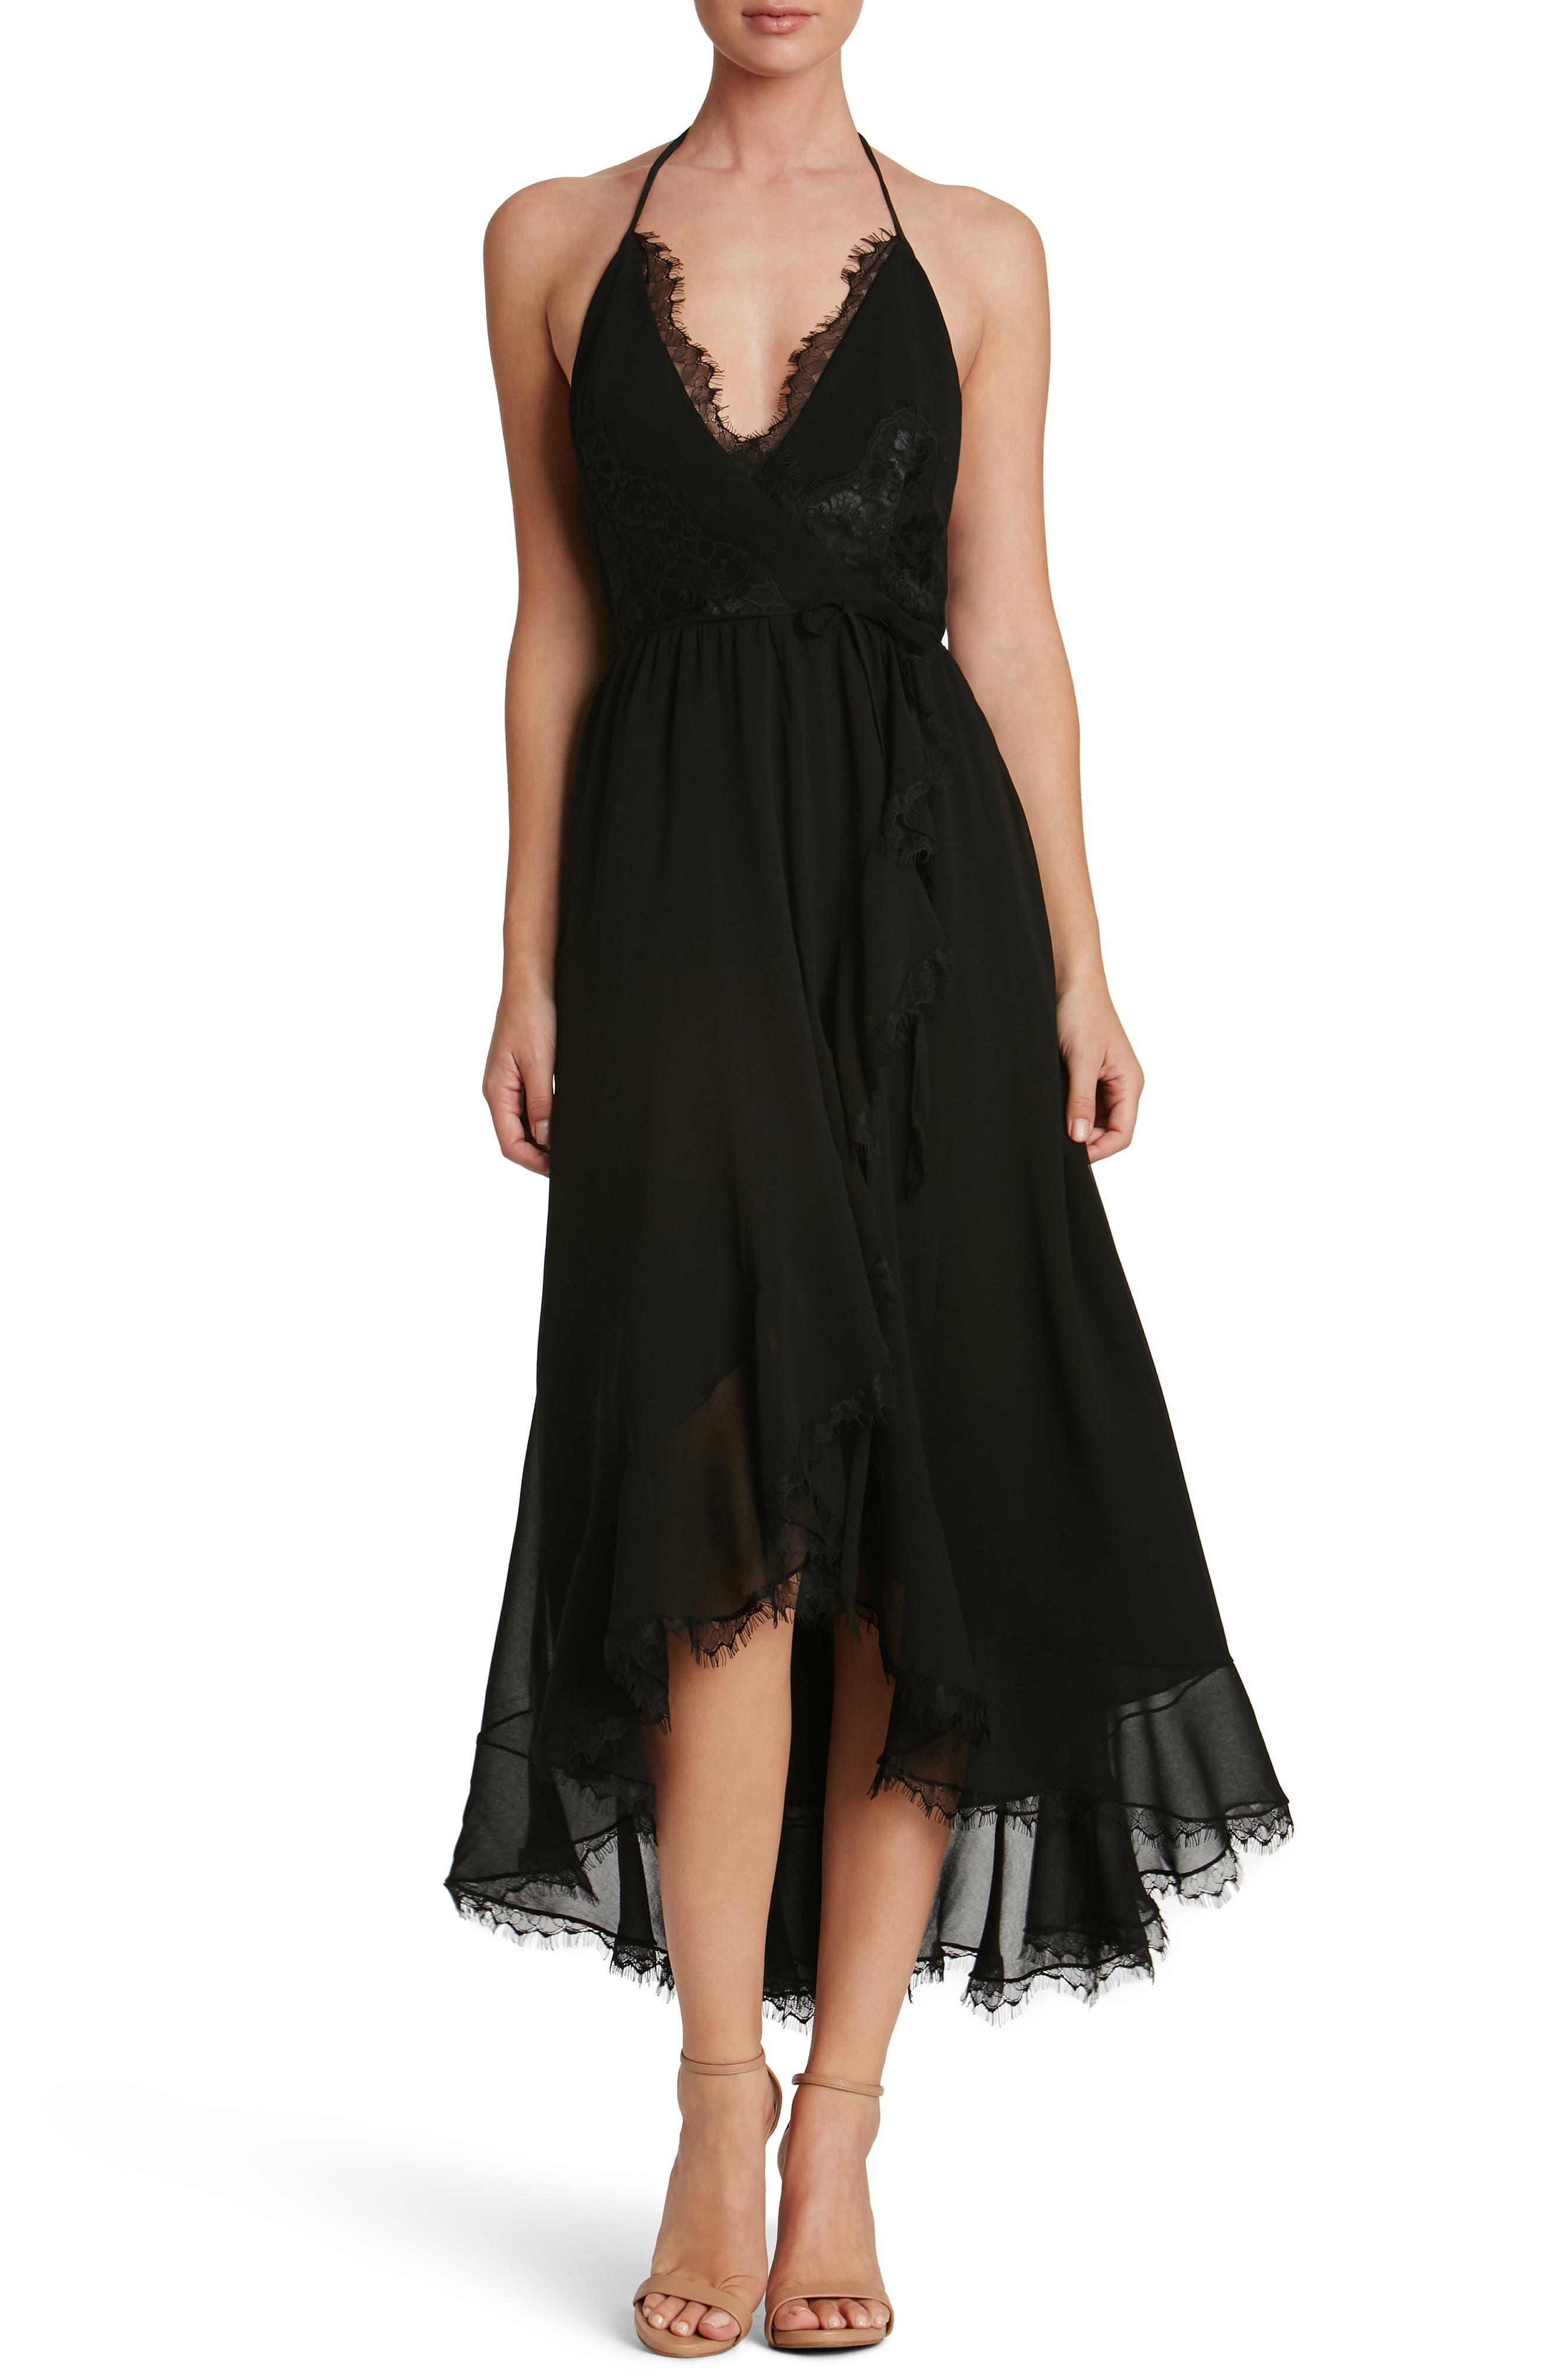 DRESS THE POPULATION Gia Backless Chiffon Wrap Dress, Main, color, 001